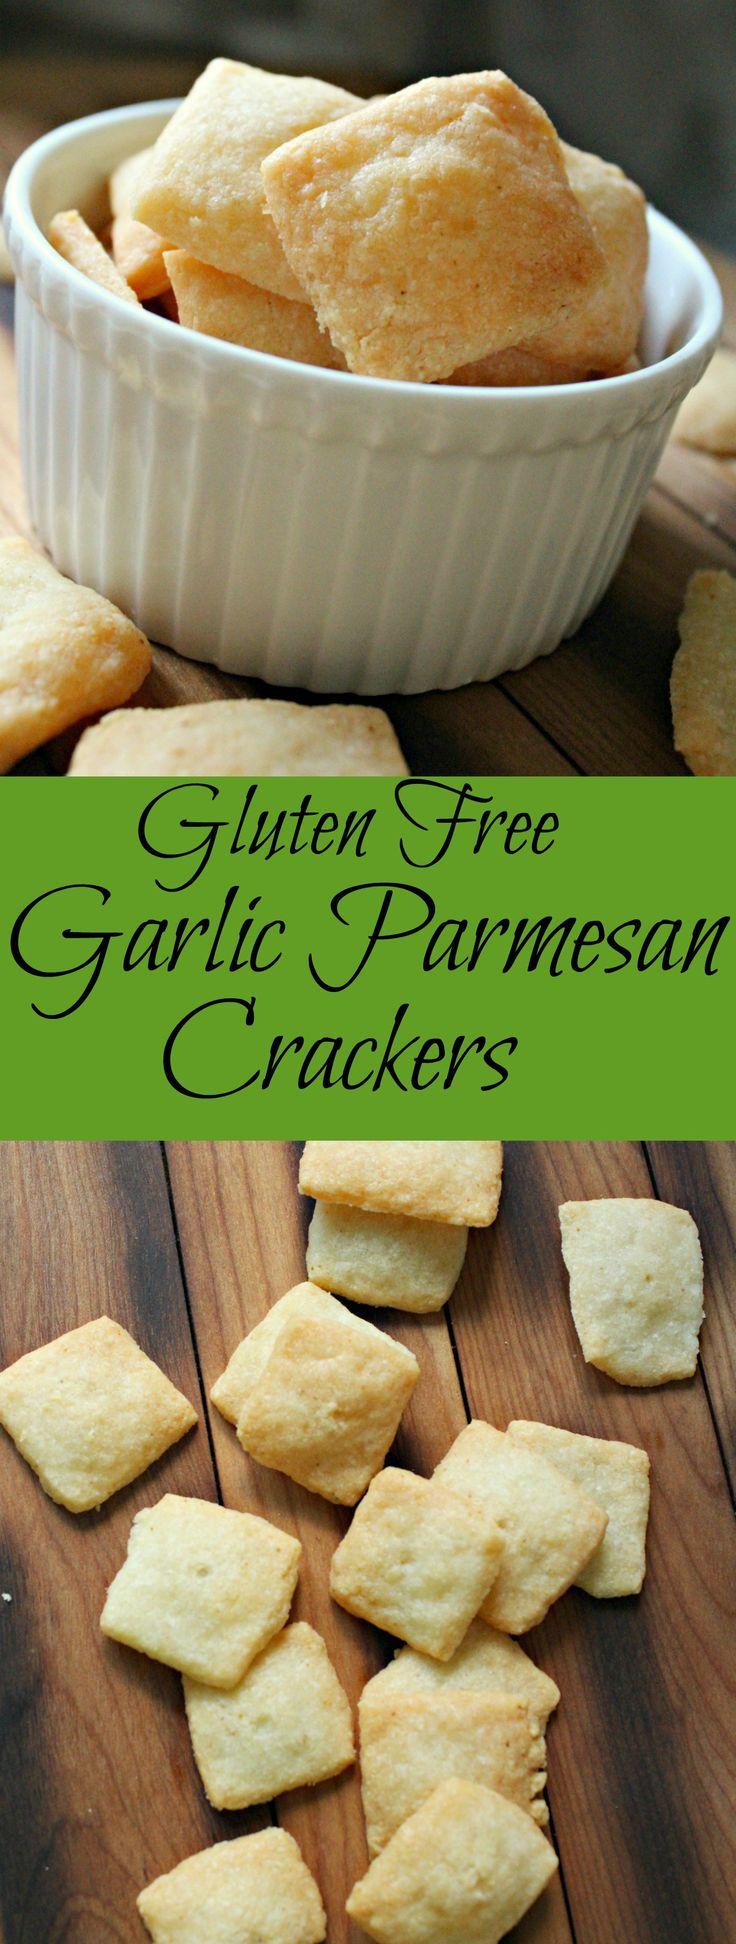 Garlic Parmesan Crackers Pin